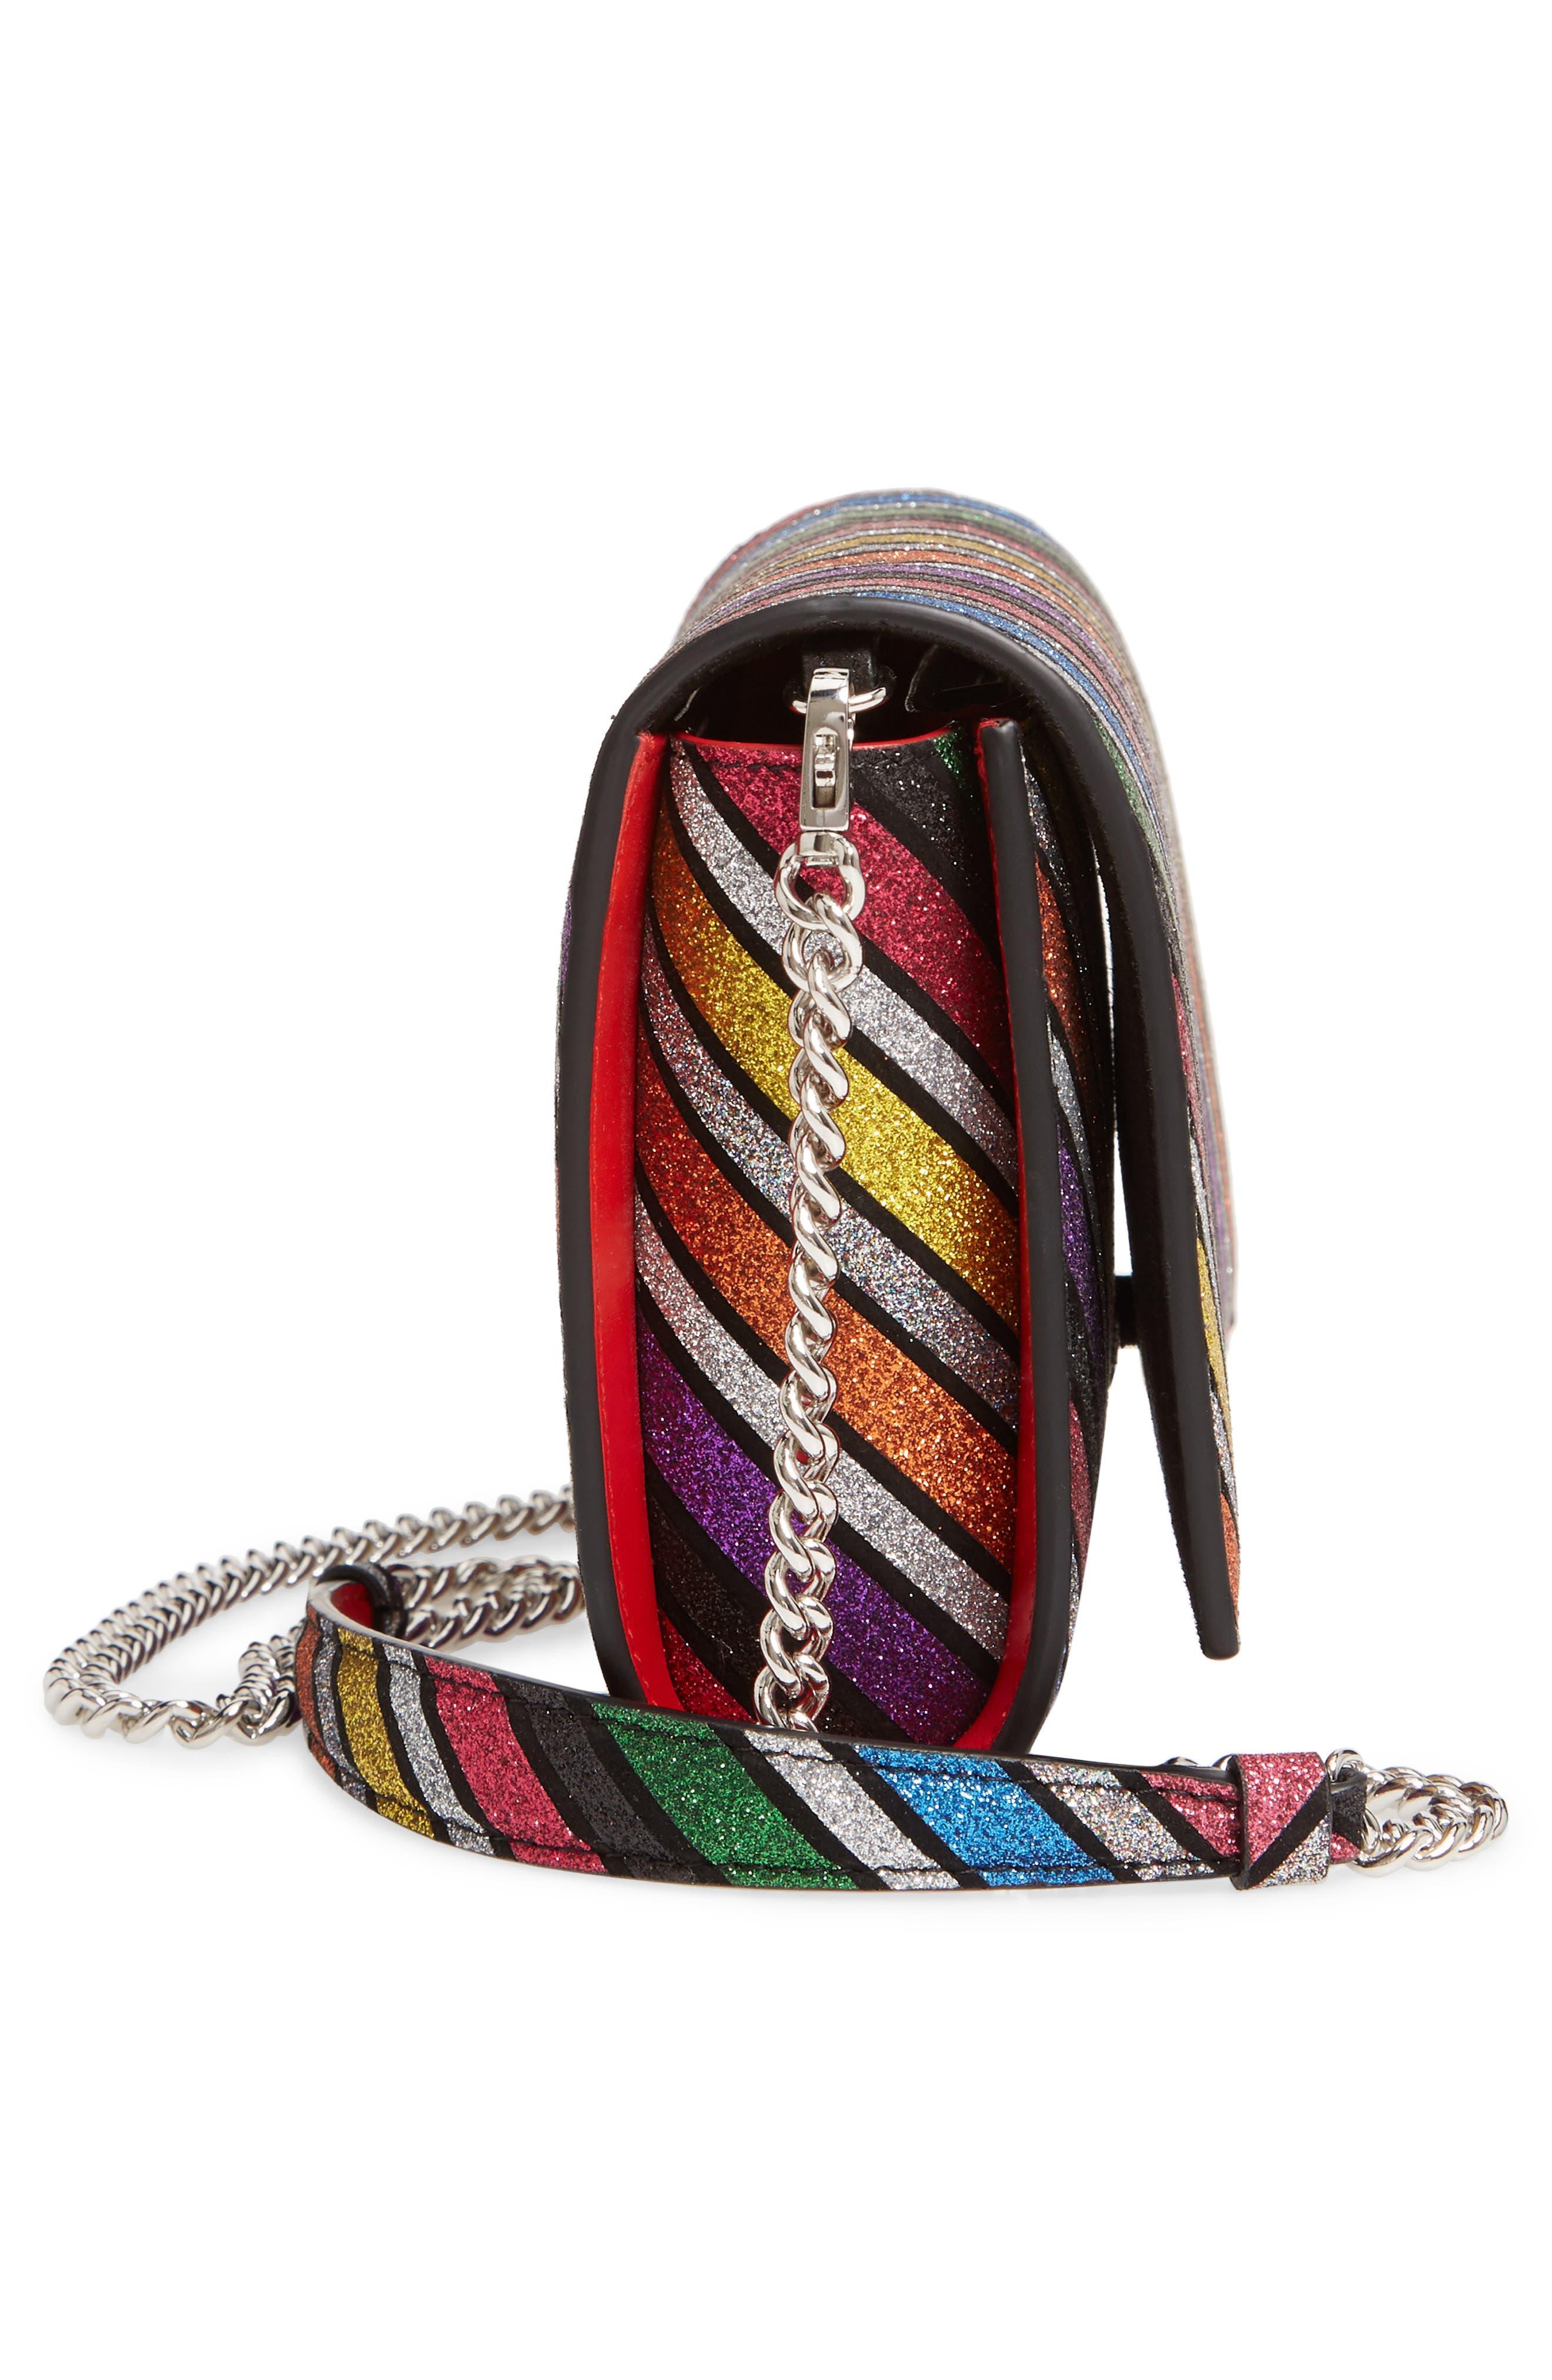 CHRISTIAN LOUBOUTIN, Paloma Glitter Rainbow Suede Clutch, Alternate thumbnail 5, color, 040